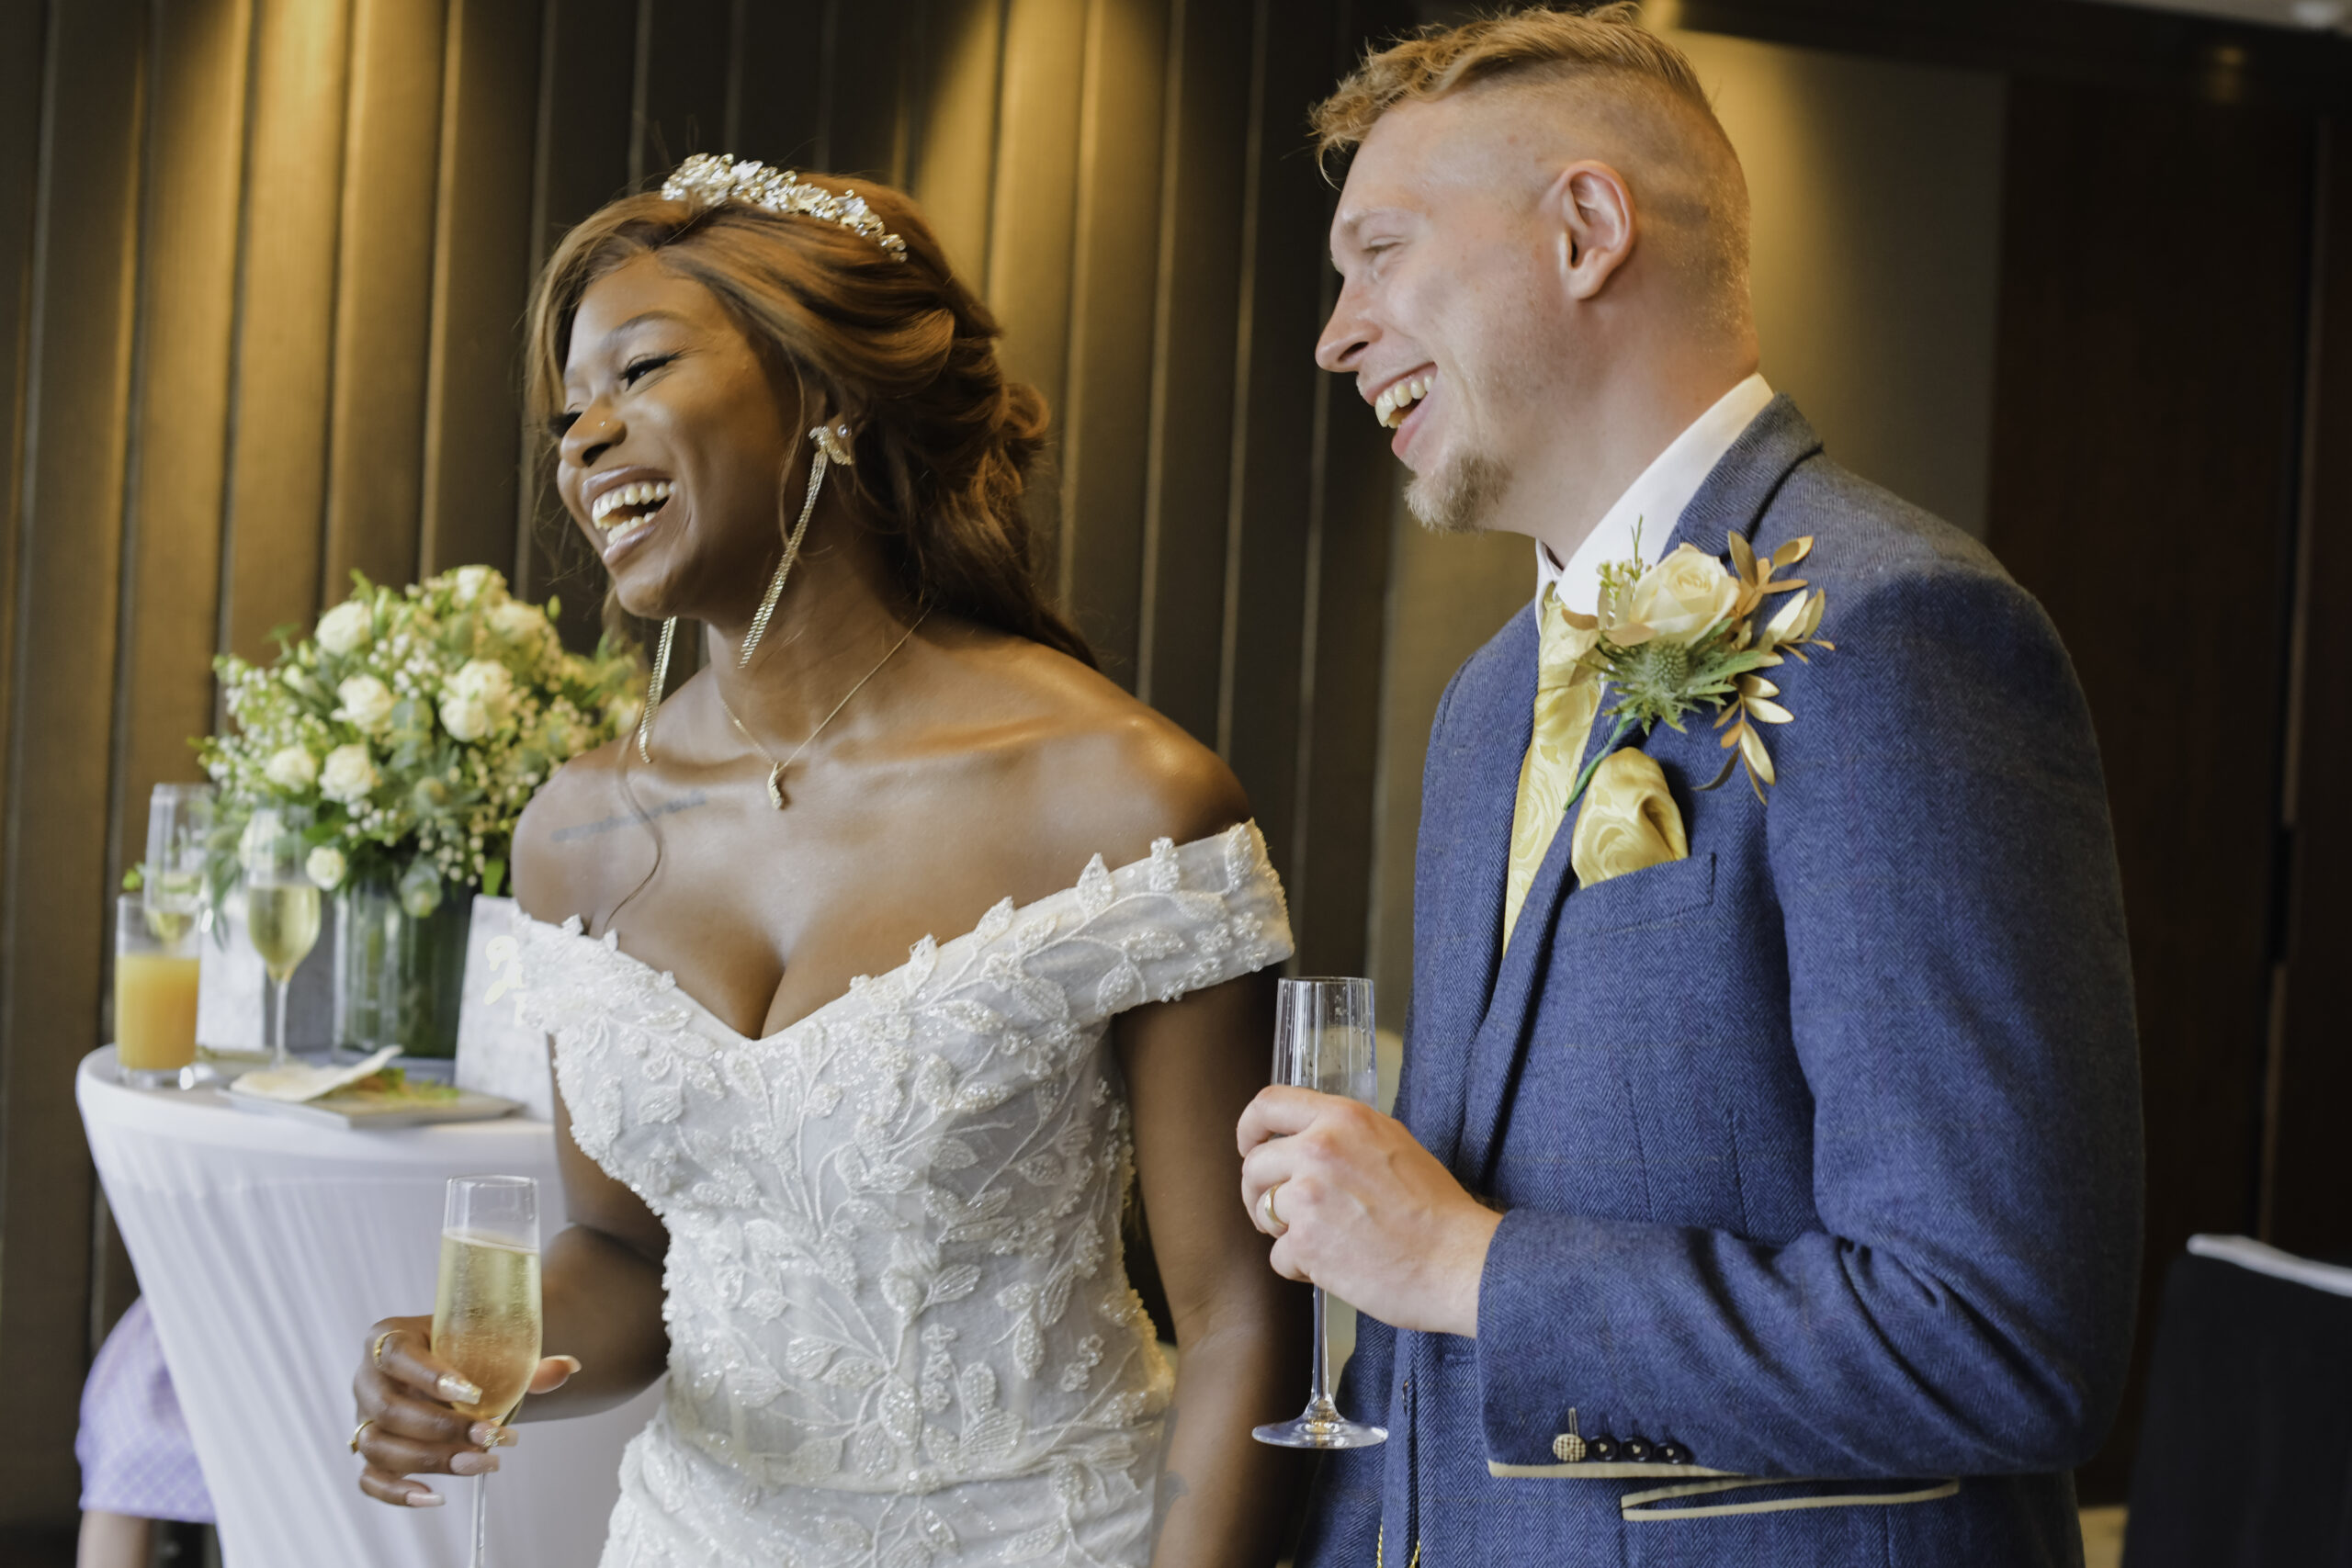 Wedding Photos at The Shard